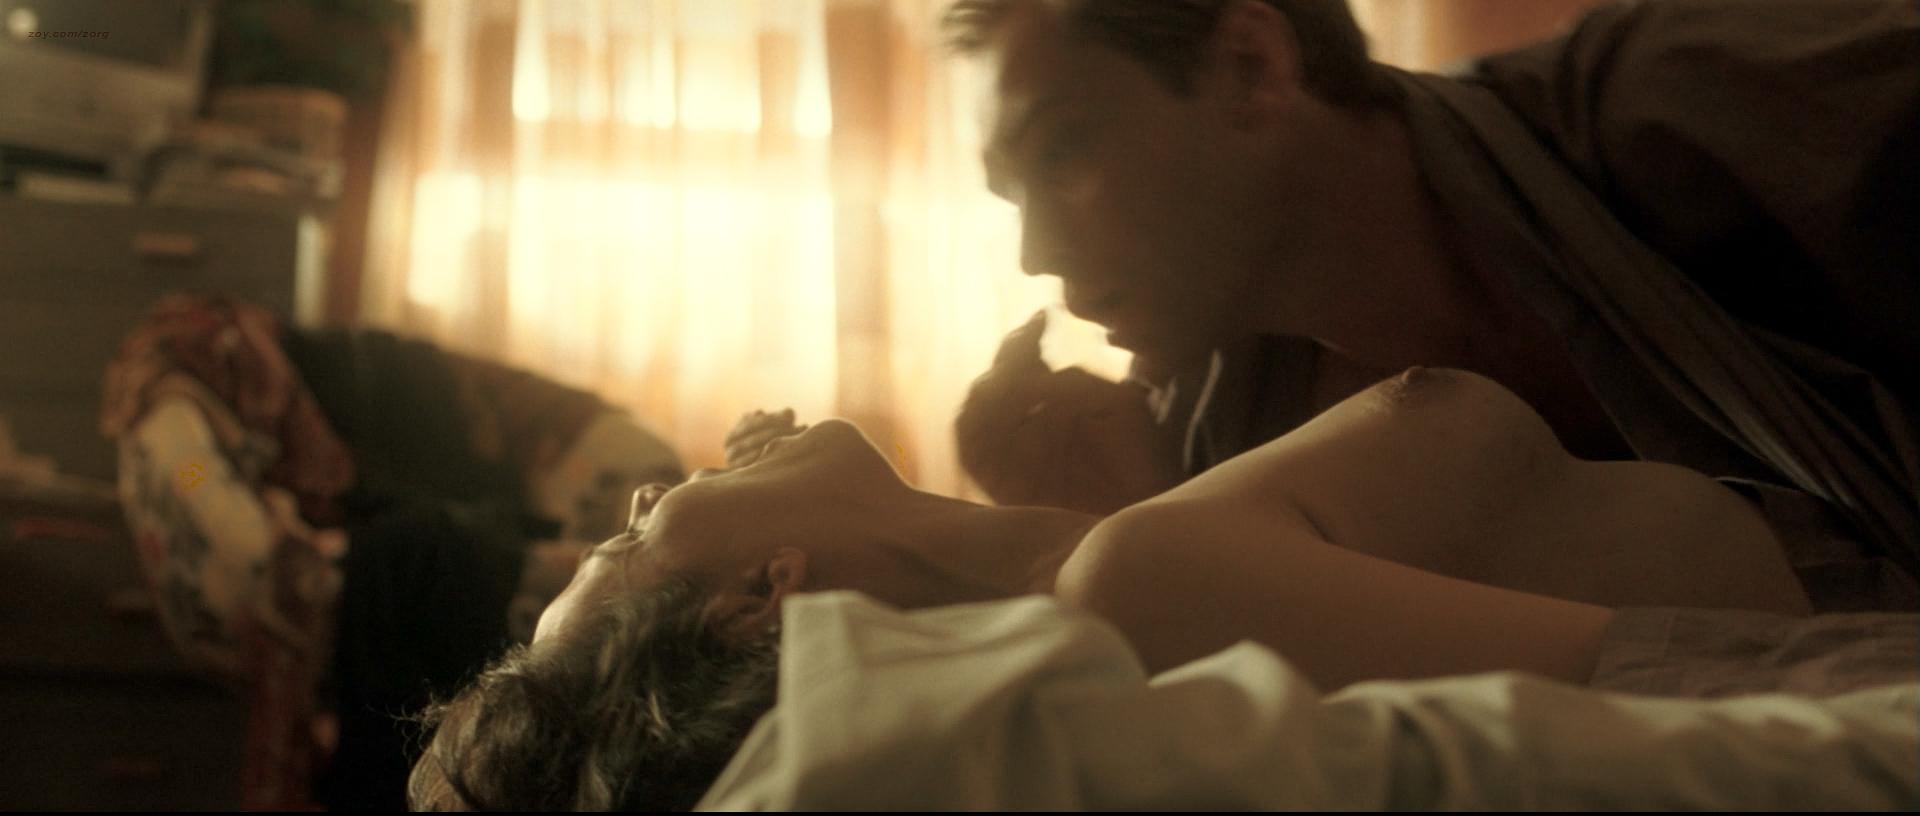 Juliette Binoche nude topless and sex Vera Farmiga nude and Robin Wright hot - Breaking and Entering (2006) HD 1080p BluRay (12)